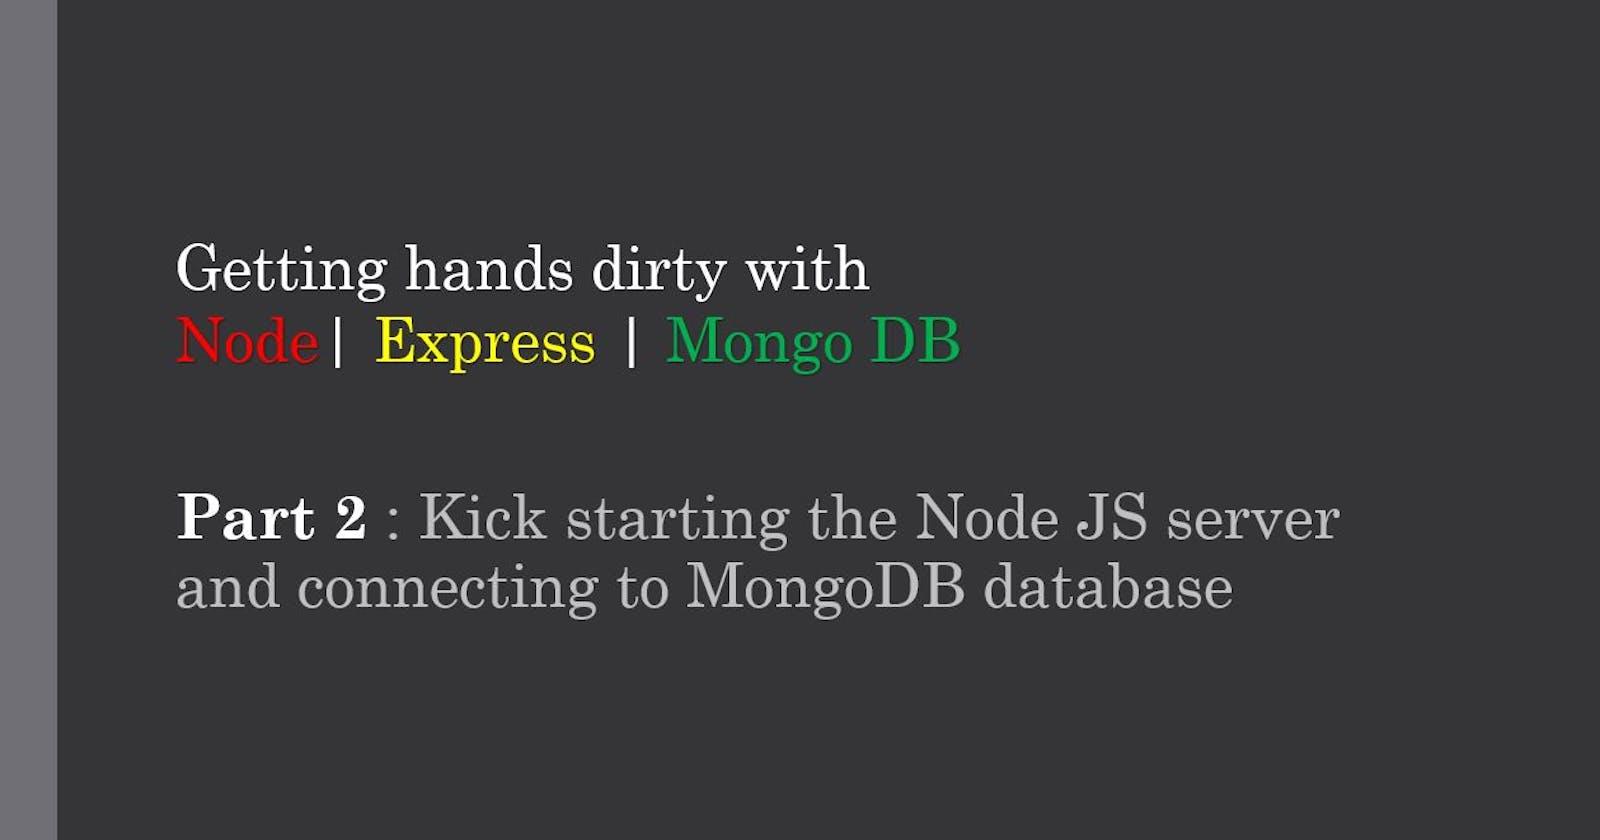 CRUD Application Using Node JS - Part 2 : Kickstarting the NodeJS server and connecting to MongoDB database.